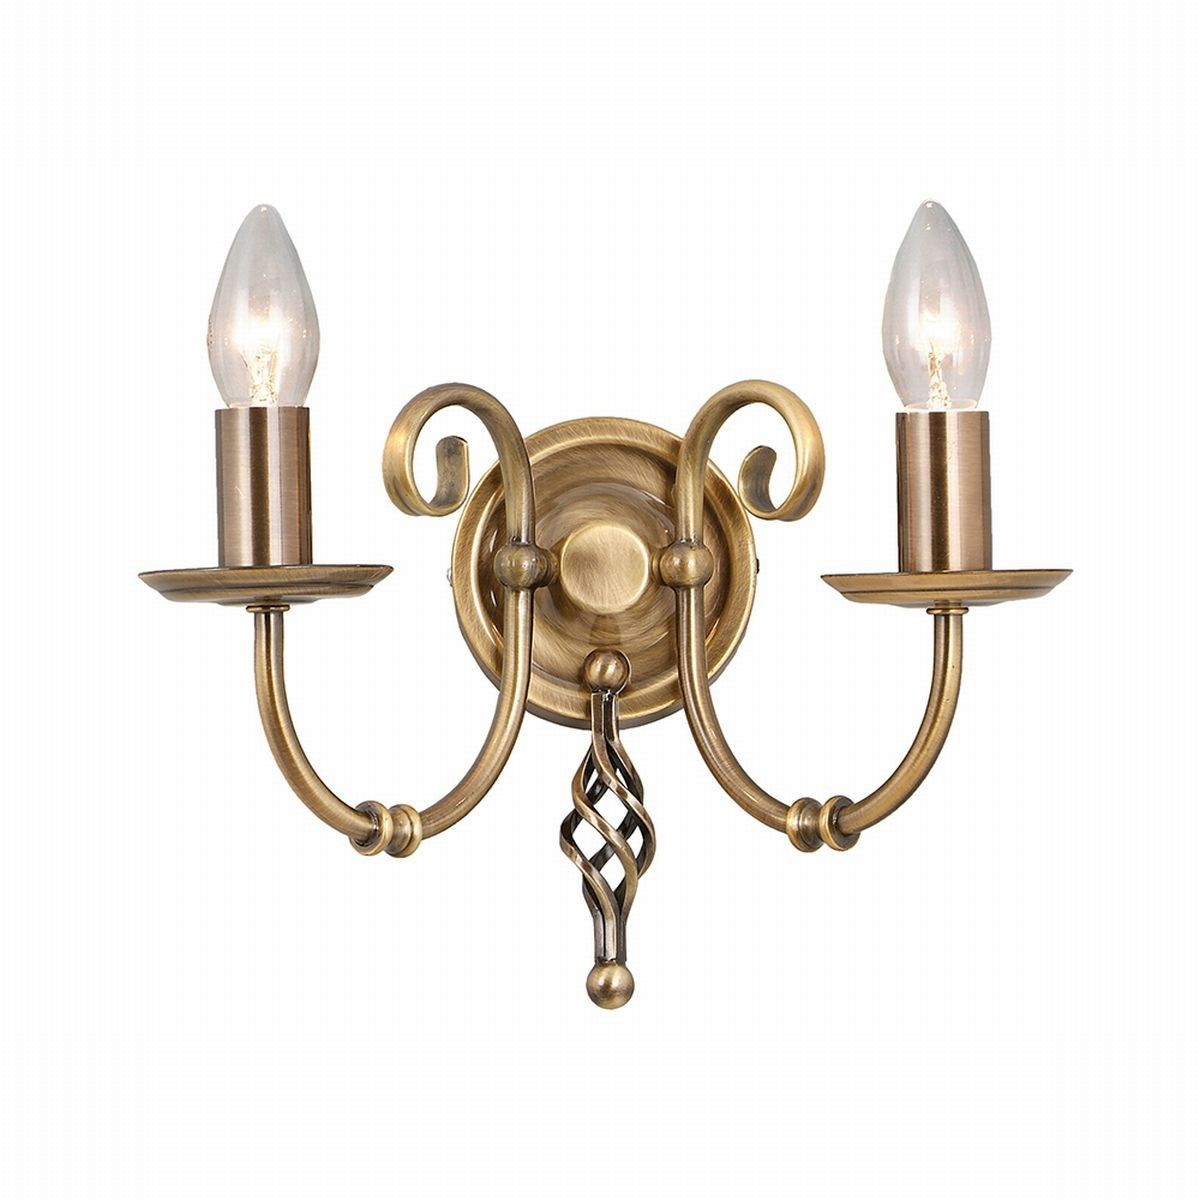 Artisan Aged Brass - Elstead Lighting - kinkiet klasyczny